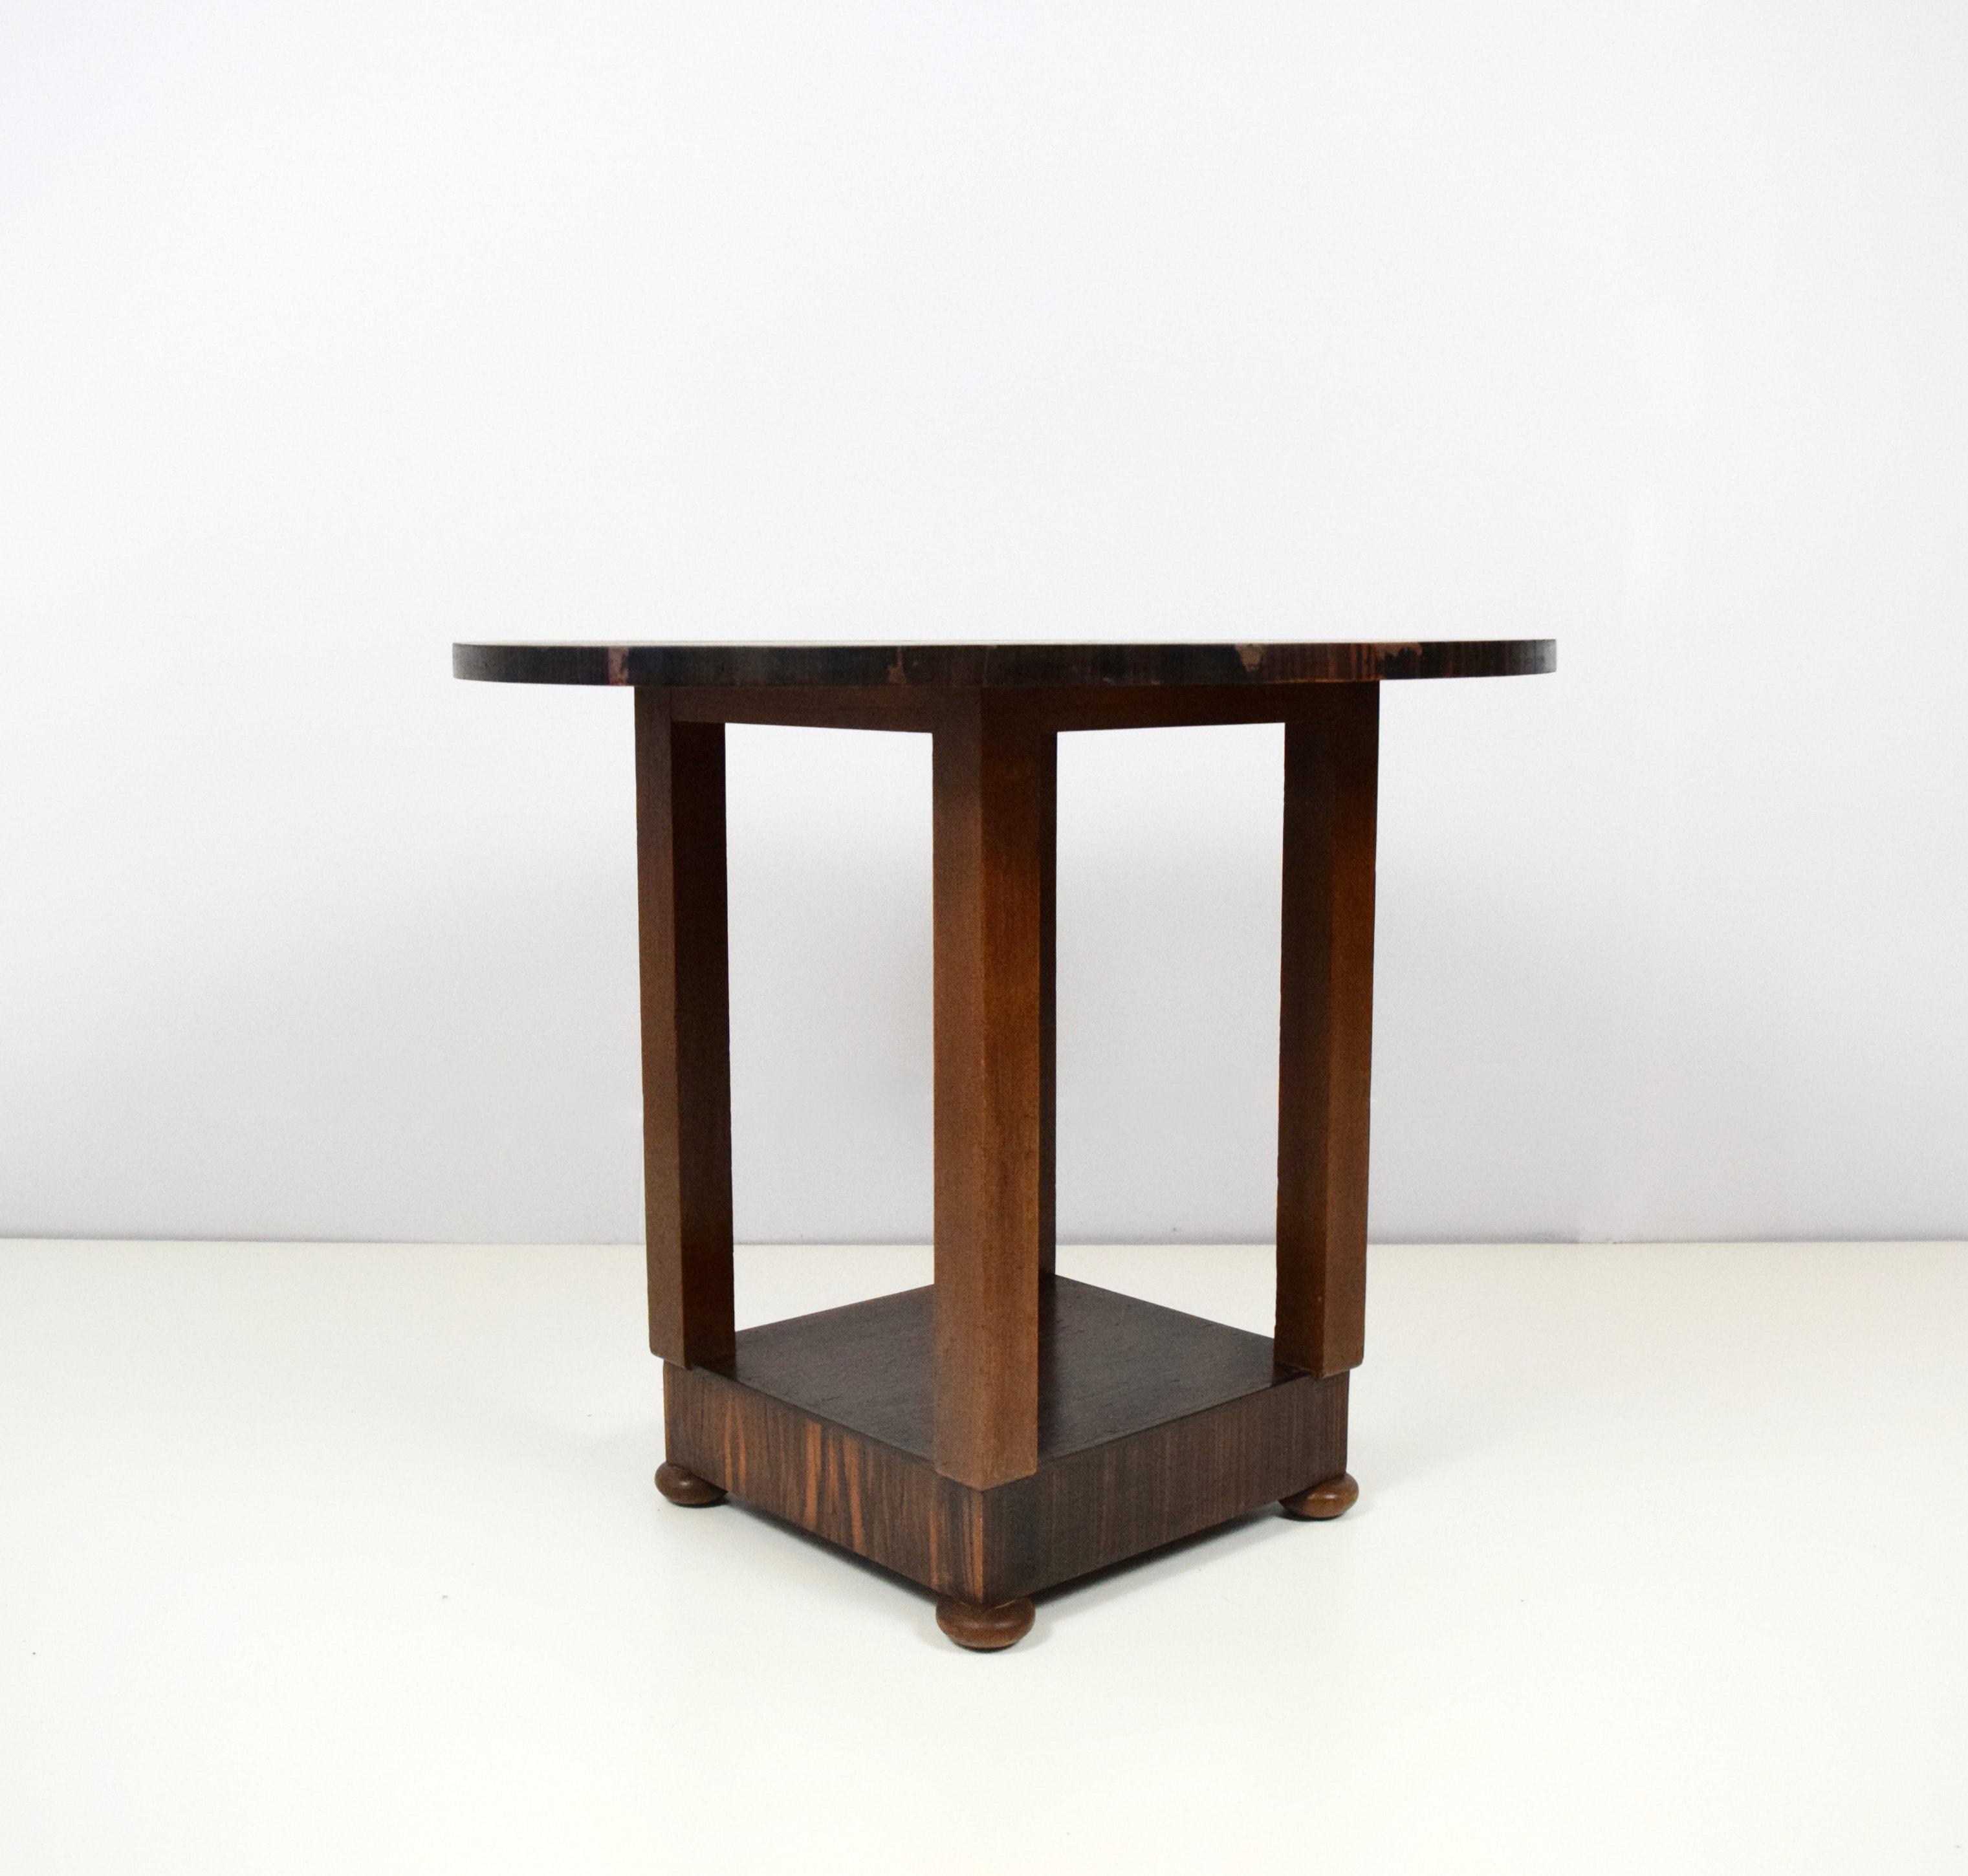 Amsterdam School Side Table, 1930's